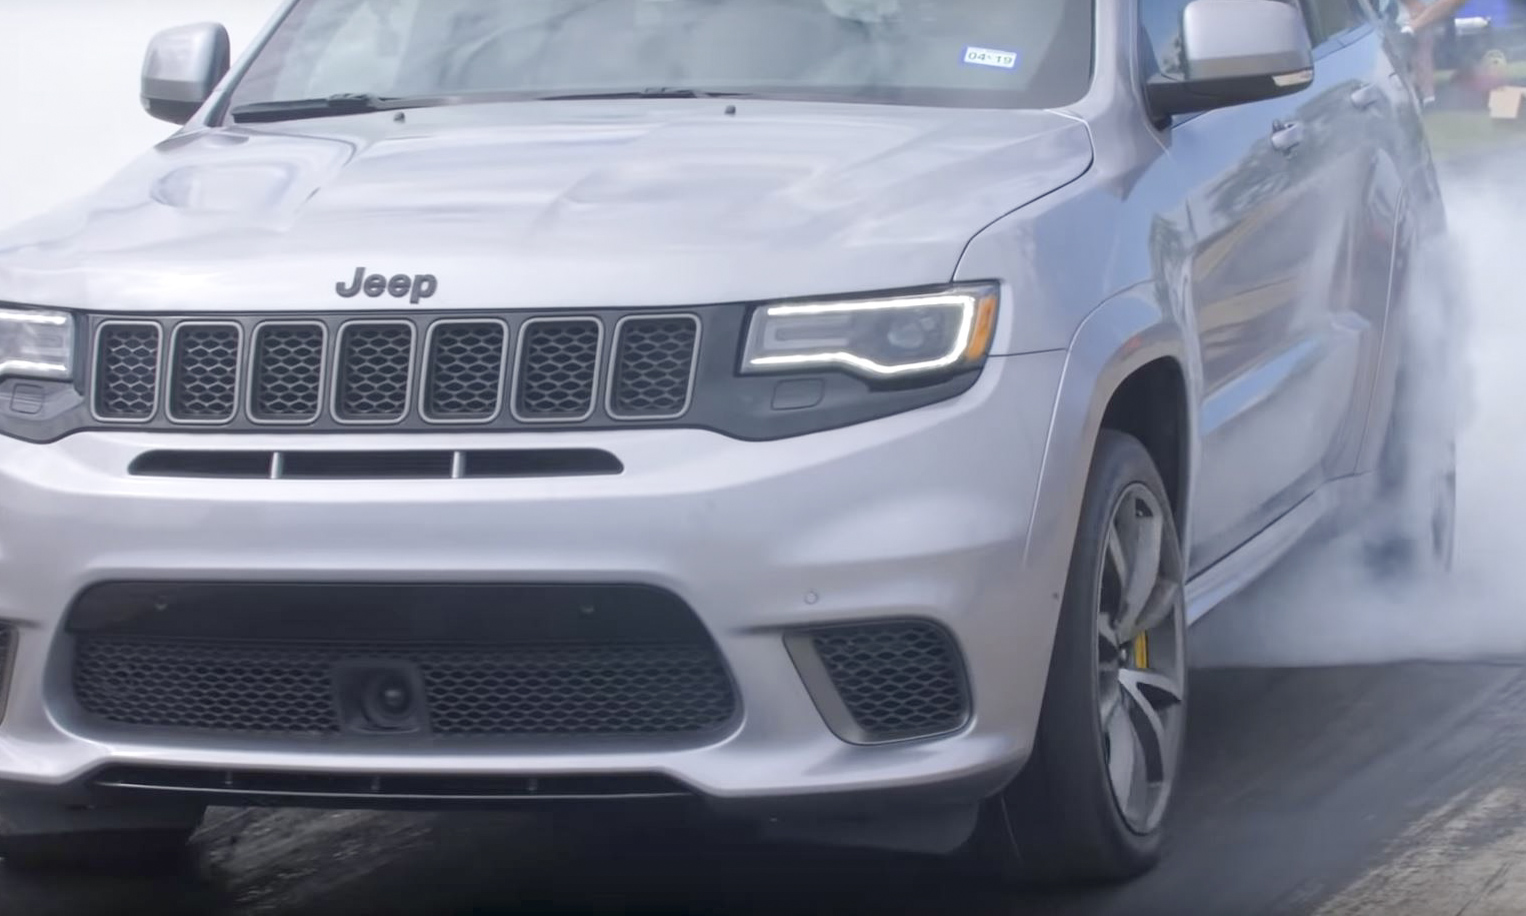 Hennessey Jeep Trackhawk — Fastest SUV on Earth - » AutoNXT